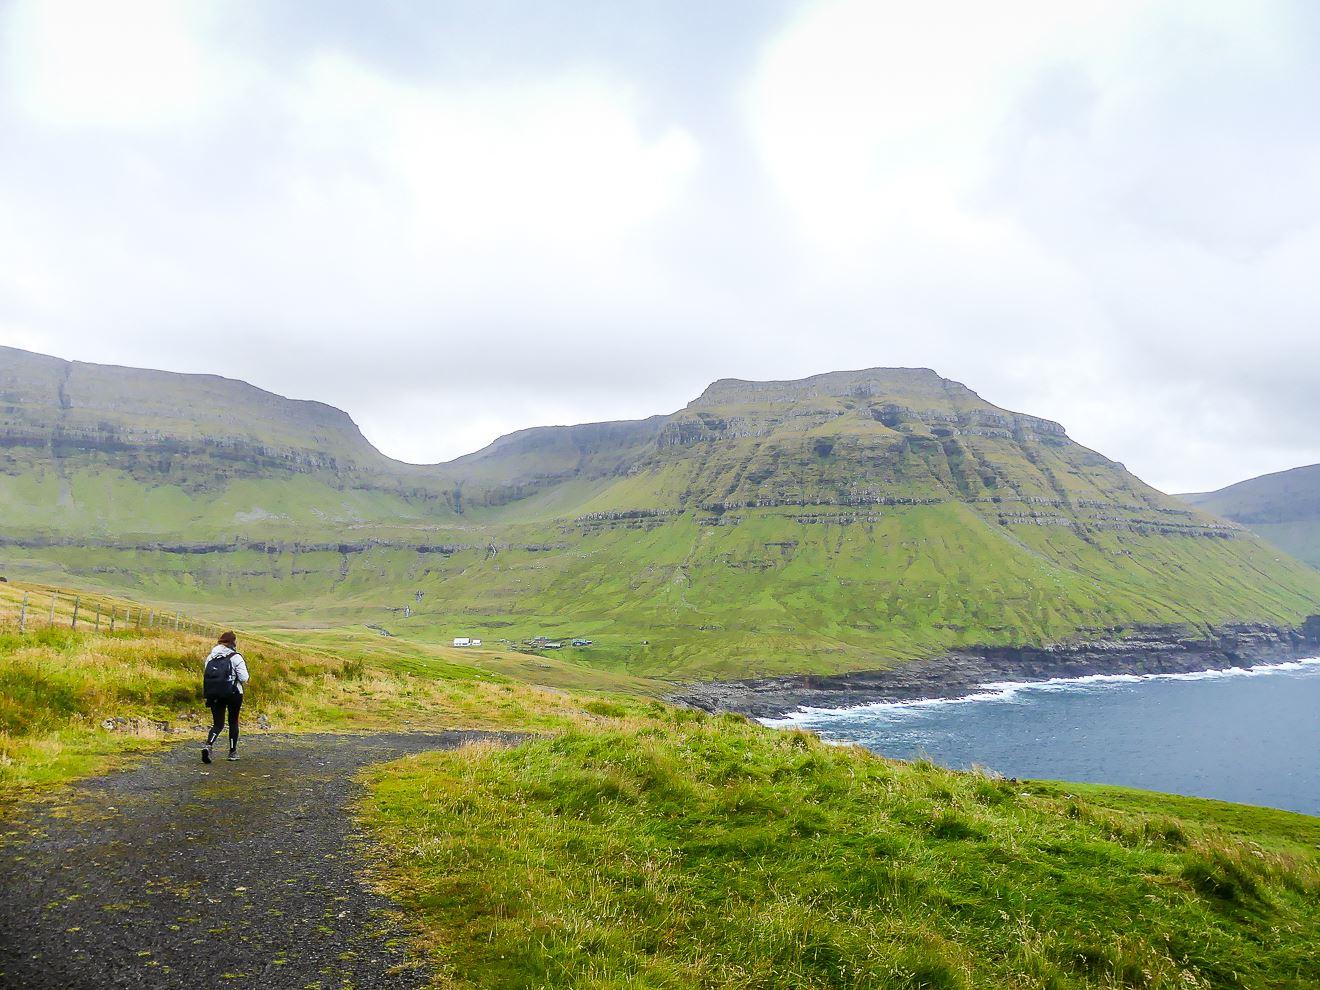 Randonnée Nordradalur - Iles Feroe